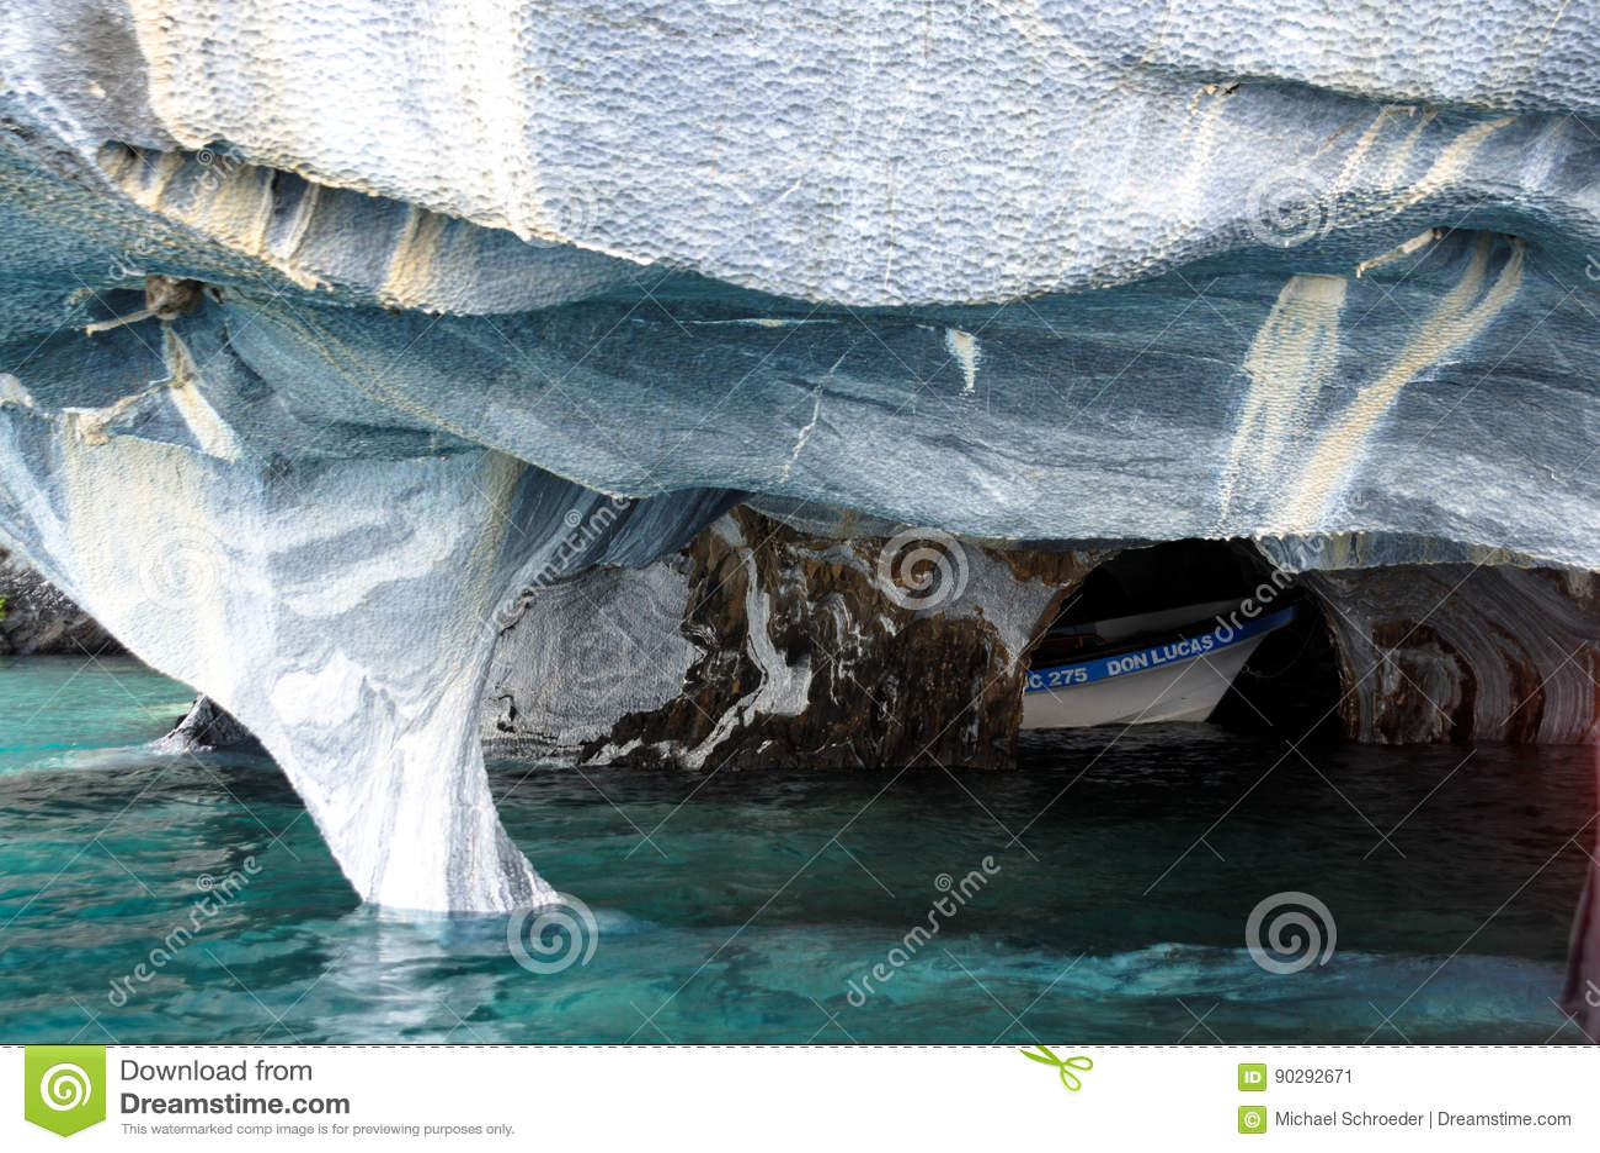 Asia Carrera Marble marble caves of lake general carrera editorial photo - image